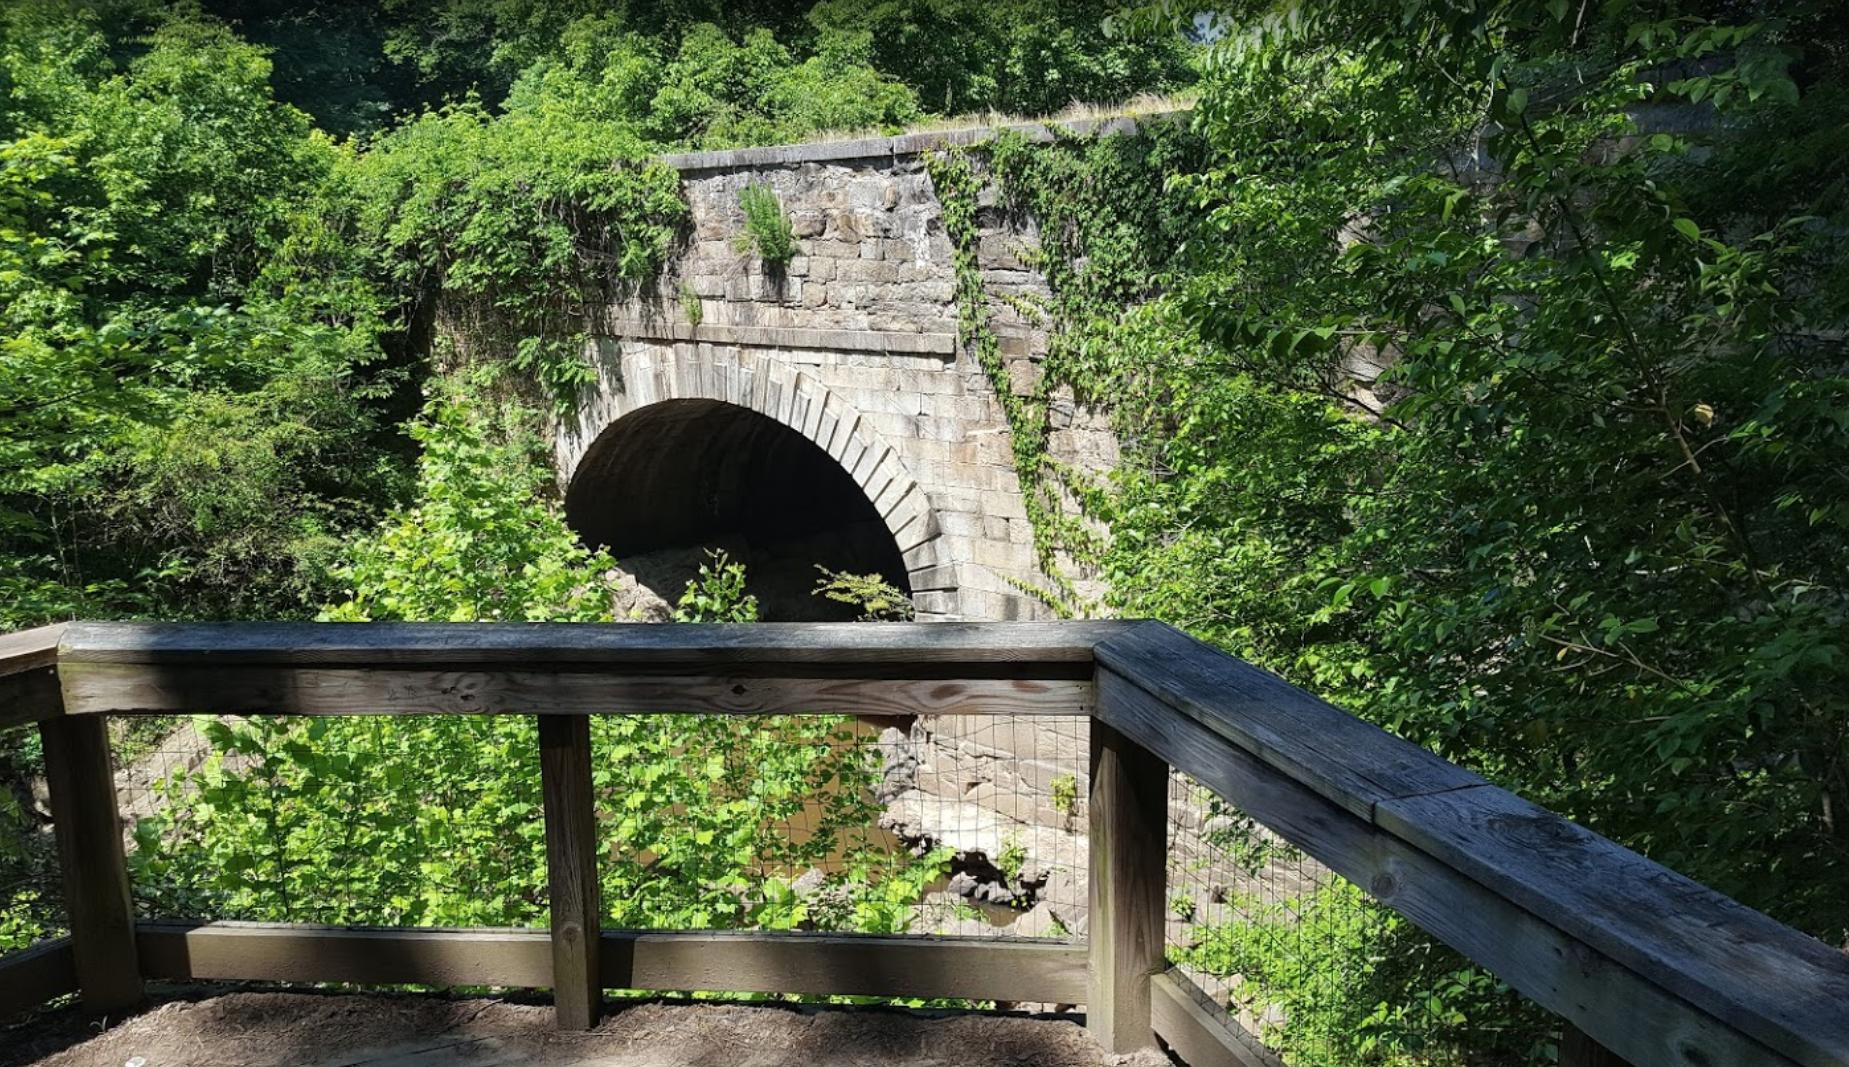 Roanoke Canal Trail Aqueduct